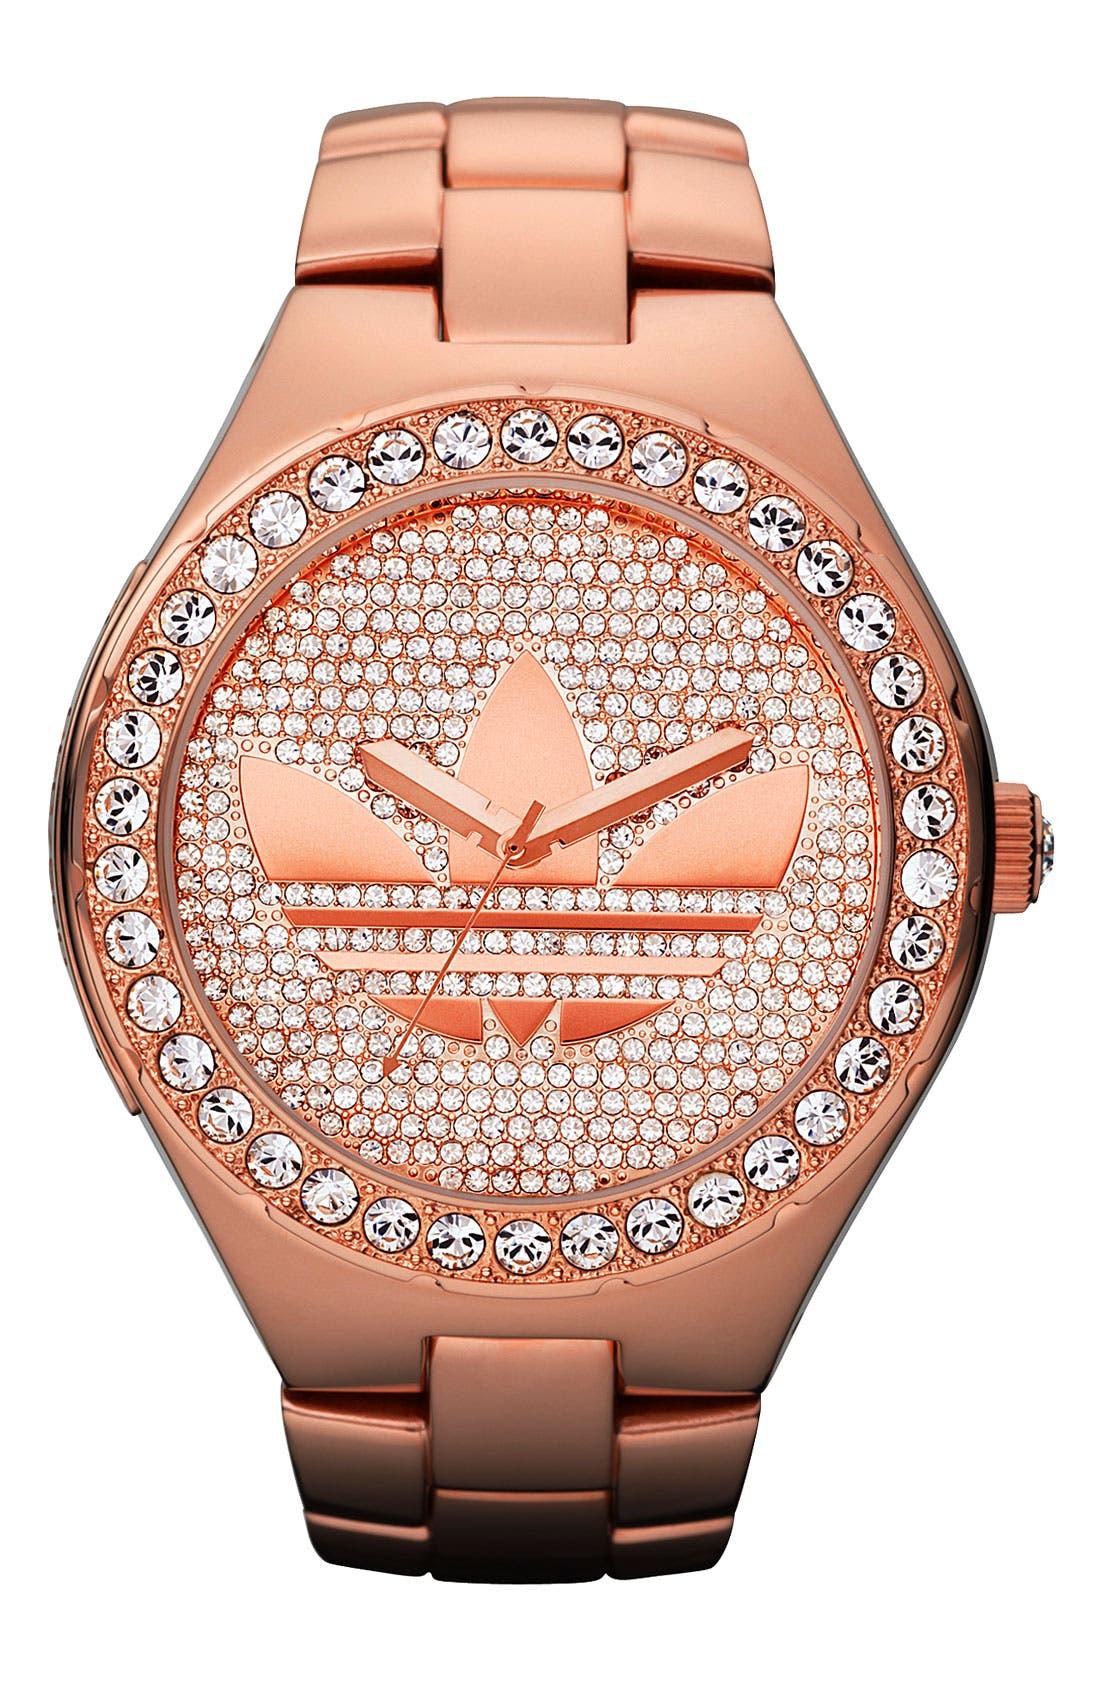 Main Image - adidas Originals 'Melbourne' Pavé Crystal Watch, 50mm